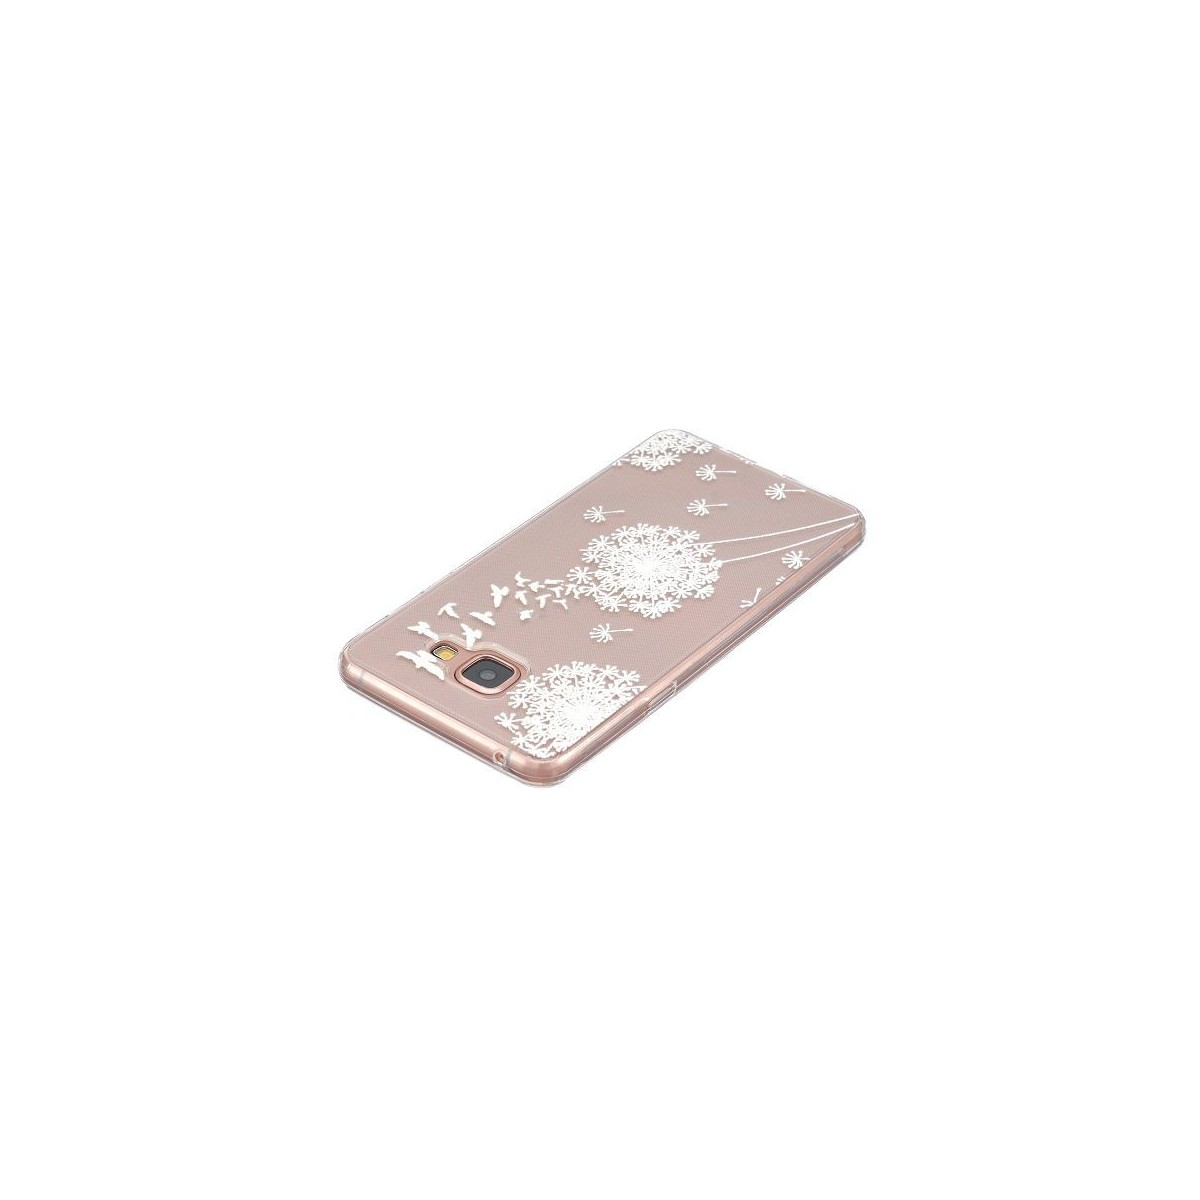 Coque Galaxy A3 (2016) Transparente souple motif fleurs blanches - Crazy Kase